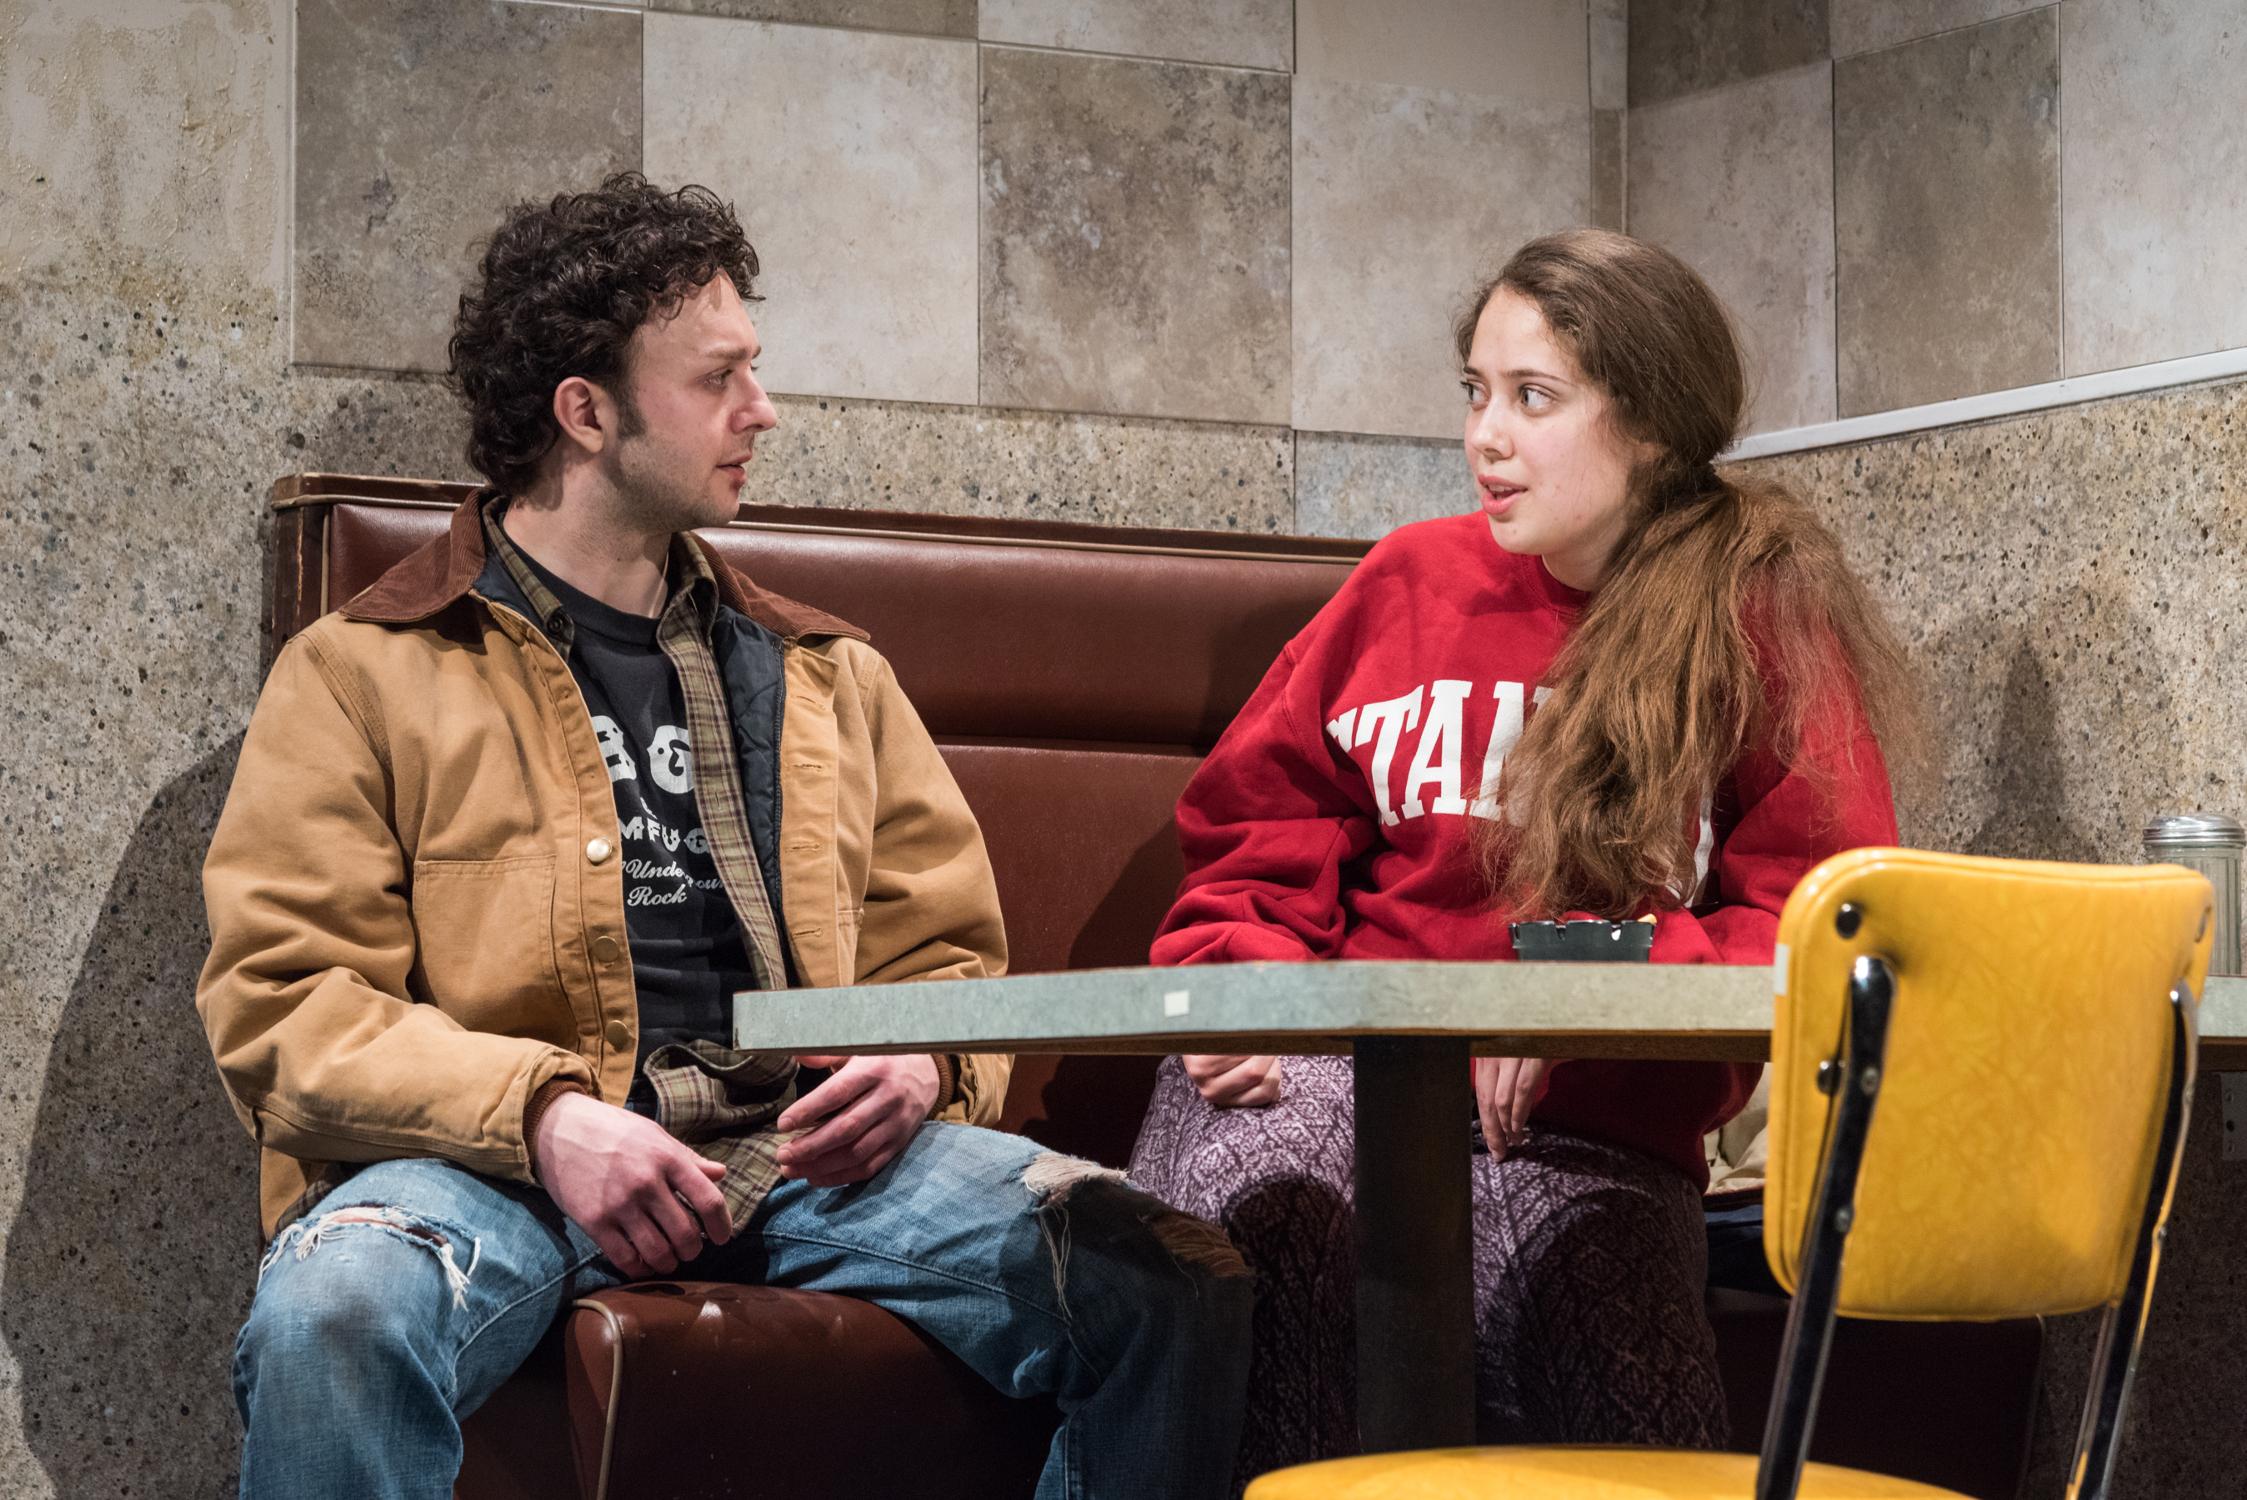 James Kautz as Adam, Rachel Franco as Tara. Photo credit: Russ Rowland